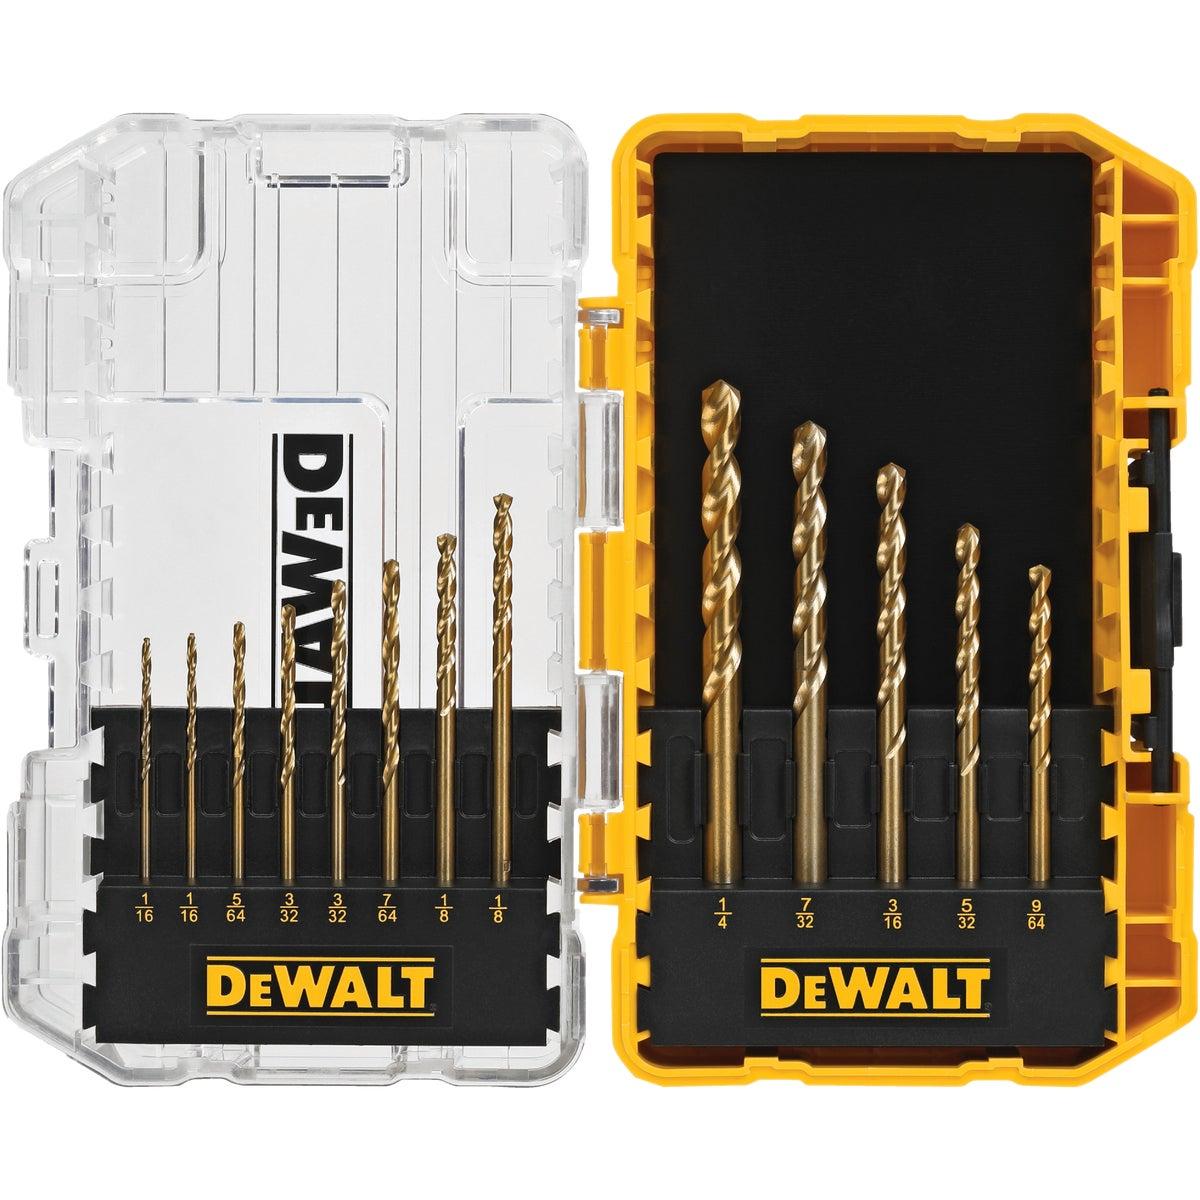 13PC DRILL BIT SET - DW1363 by DeWalt